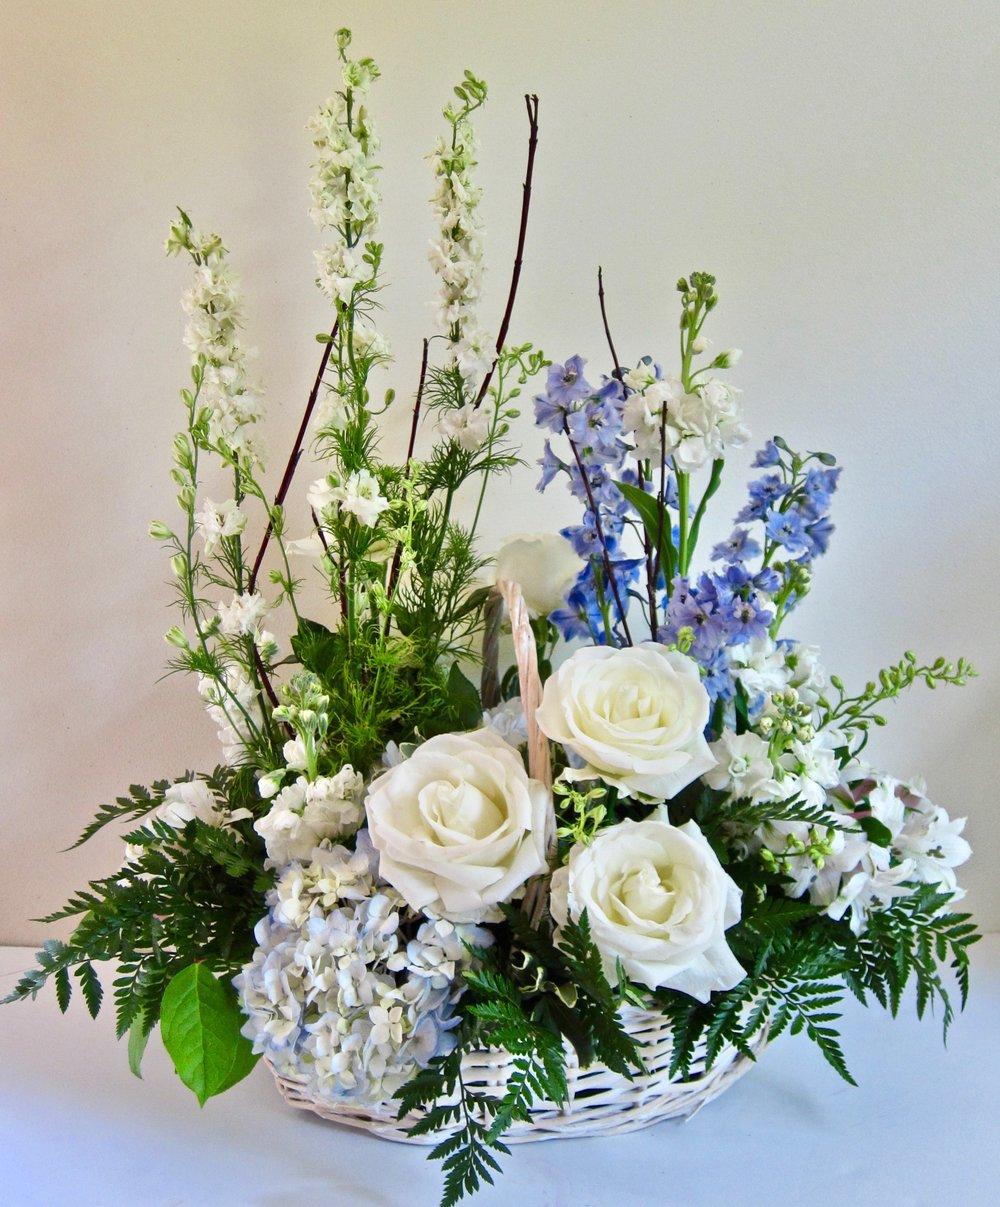 LARGE PREMIUM BASKET   Large basket of premium flowers; lilies or hydrangeas, roses, hydrangeas, snapdragons or larkspur or delphinium, $110.